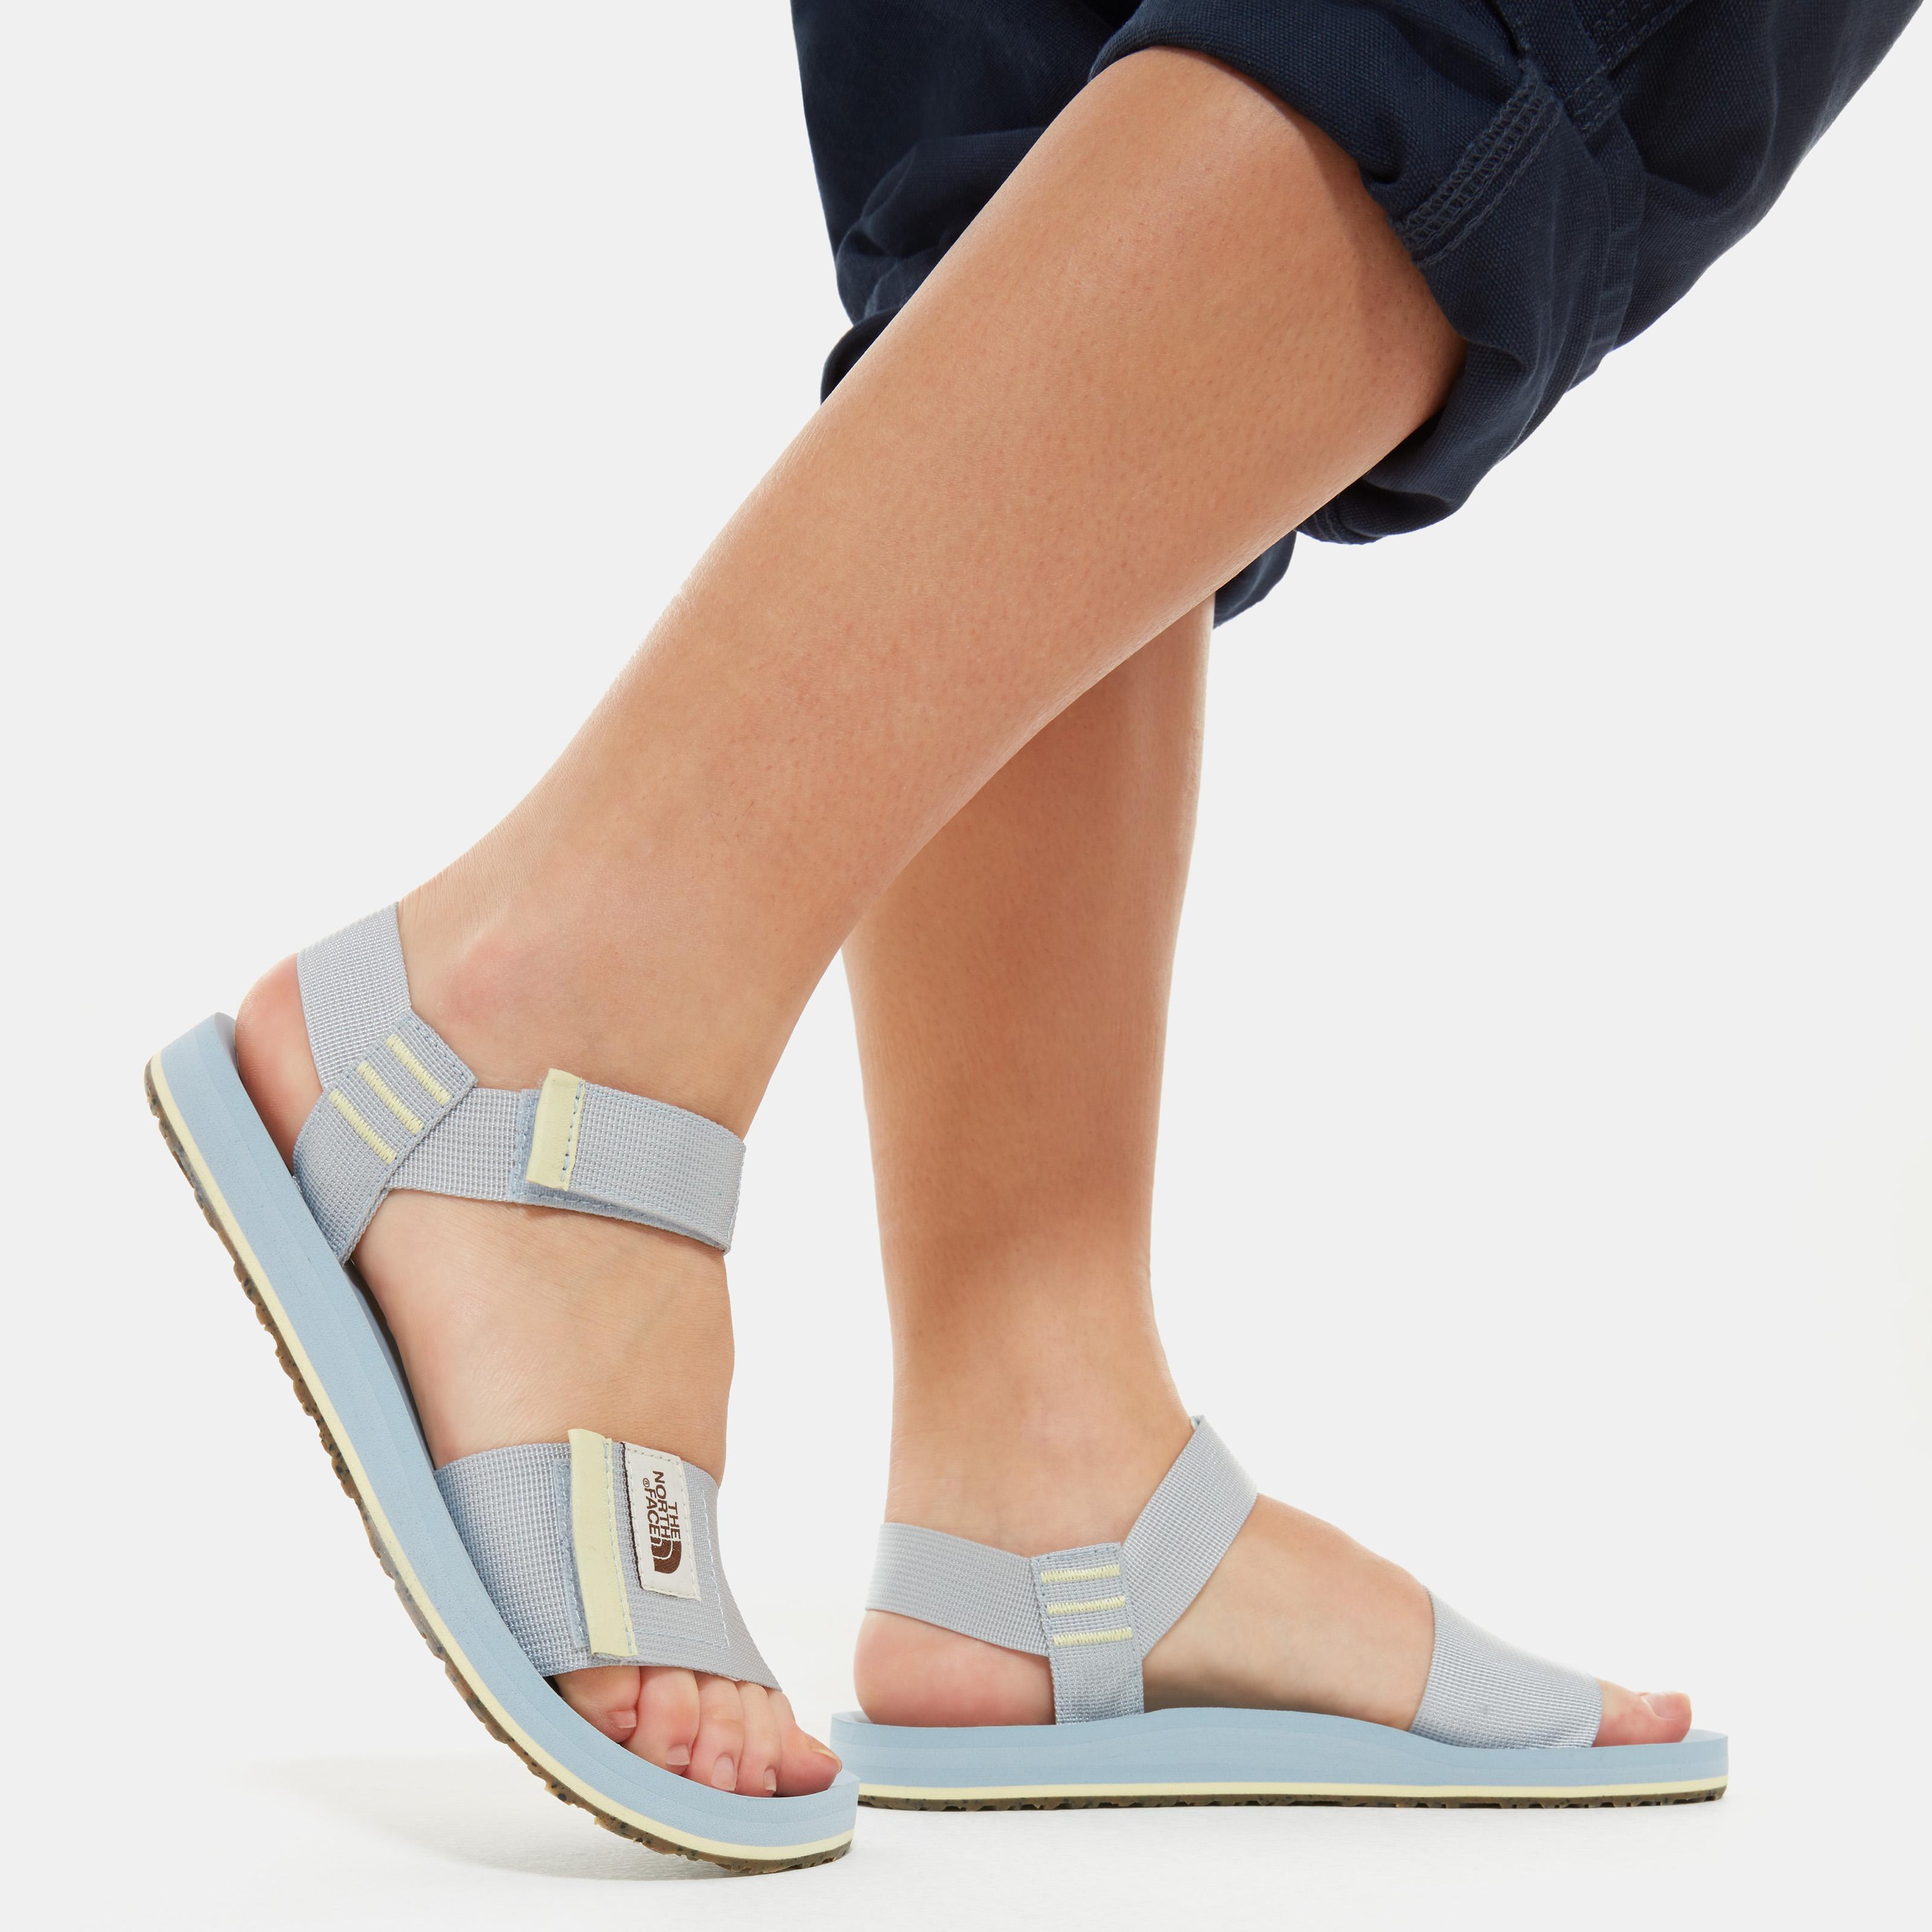 Женские сандалии Skeena фото